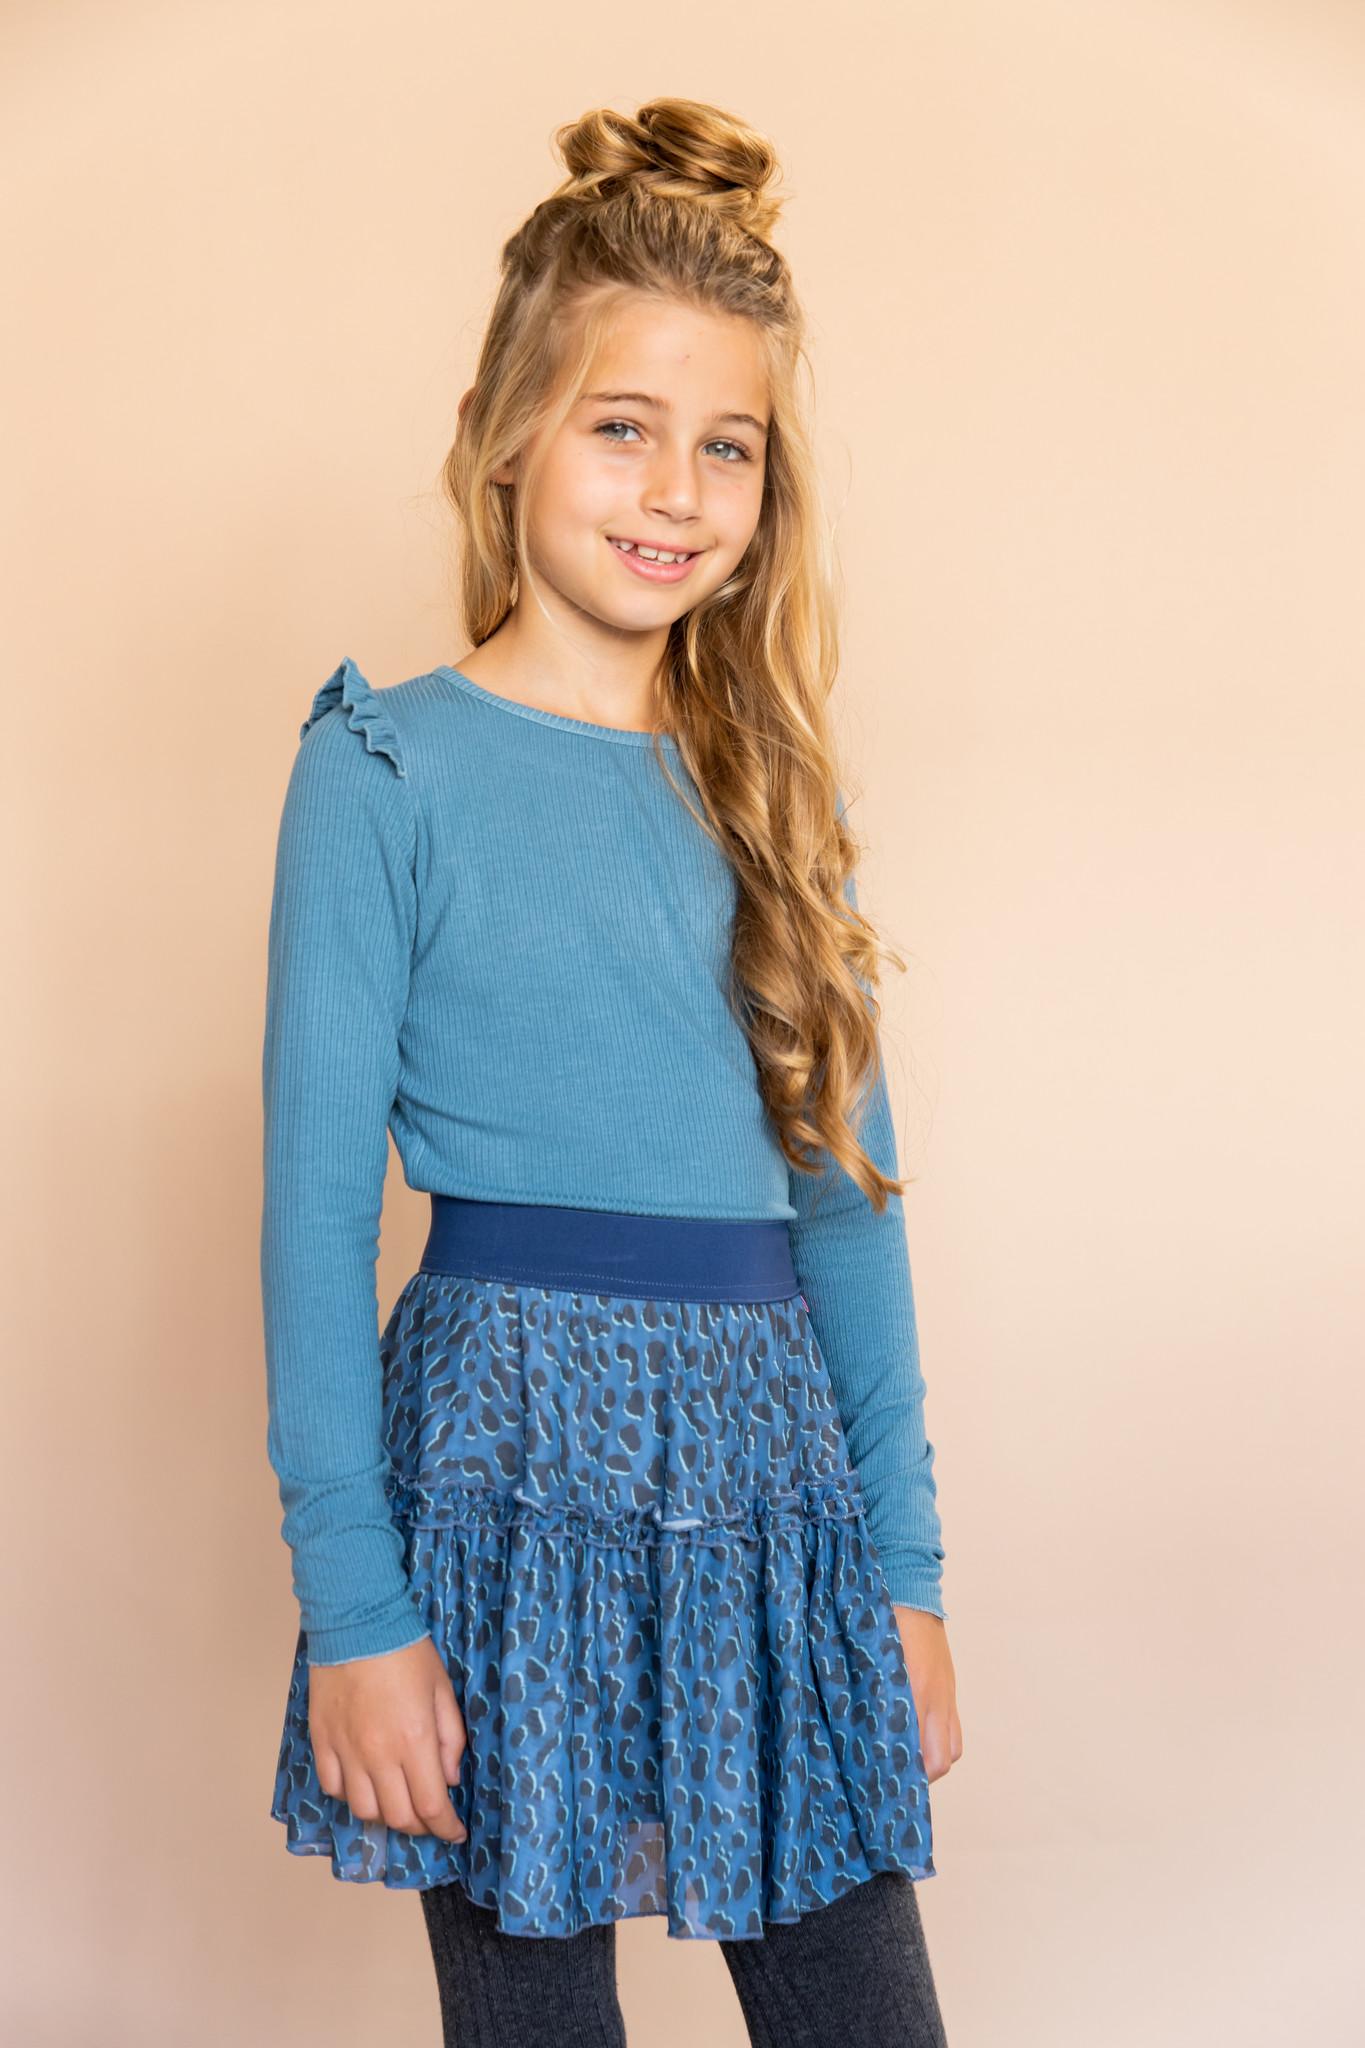 Mayce Girlslabel lookbook winter 2022-2